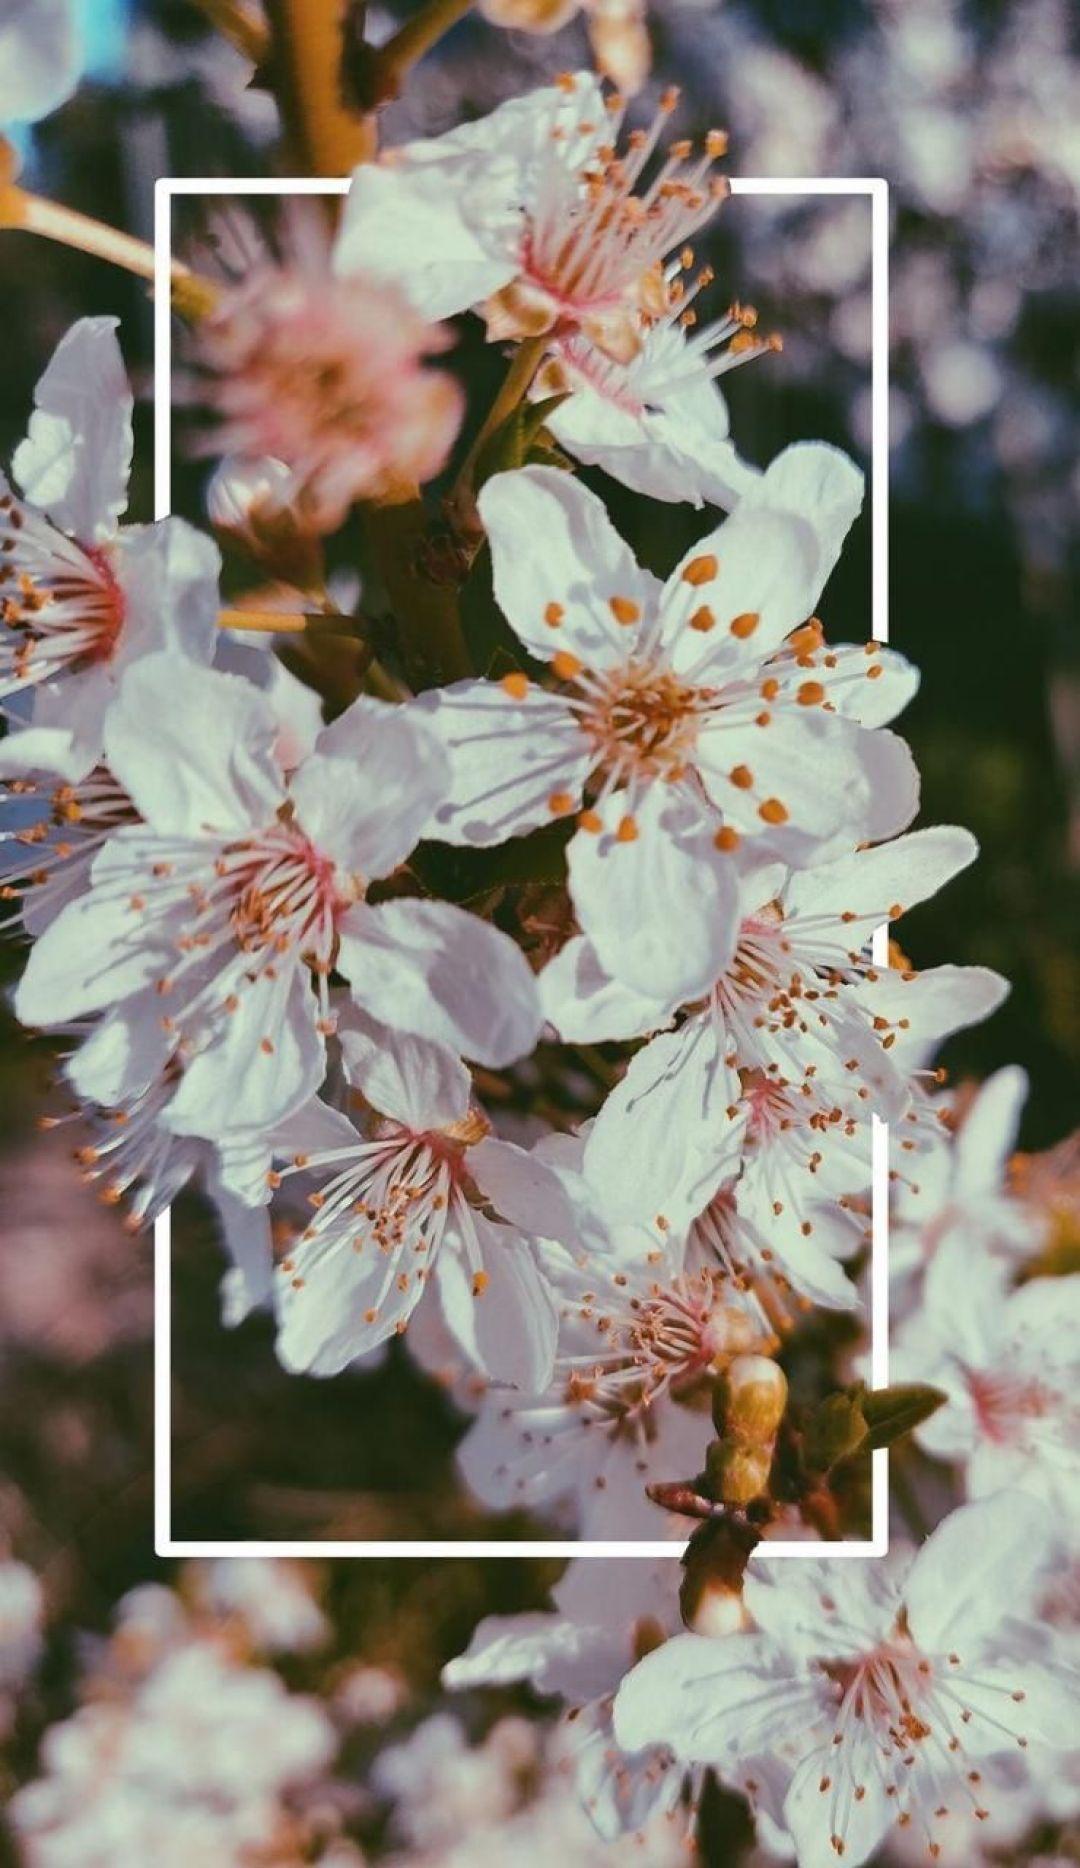 Aesthetic Hd Iphone Wallpapers Flowers Di 2020